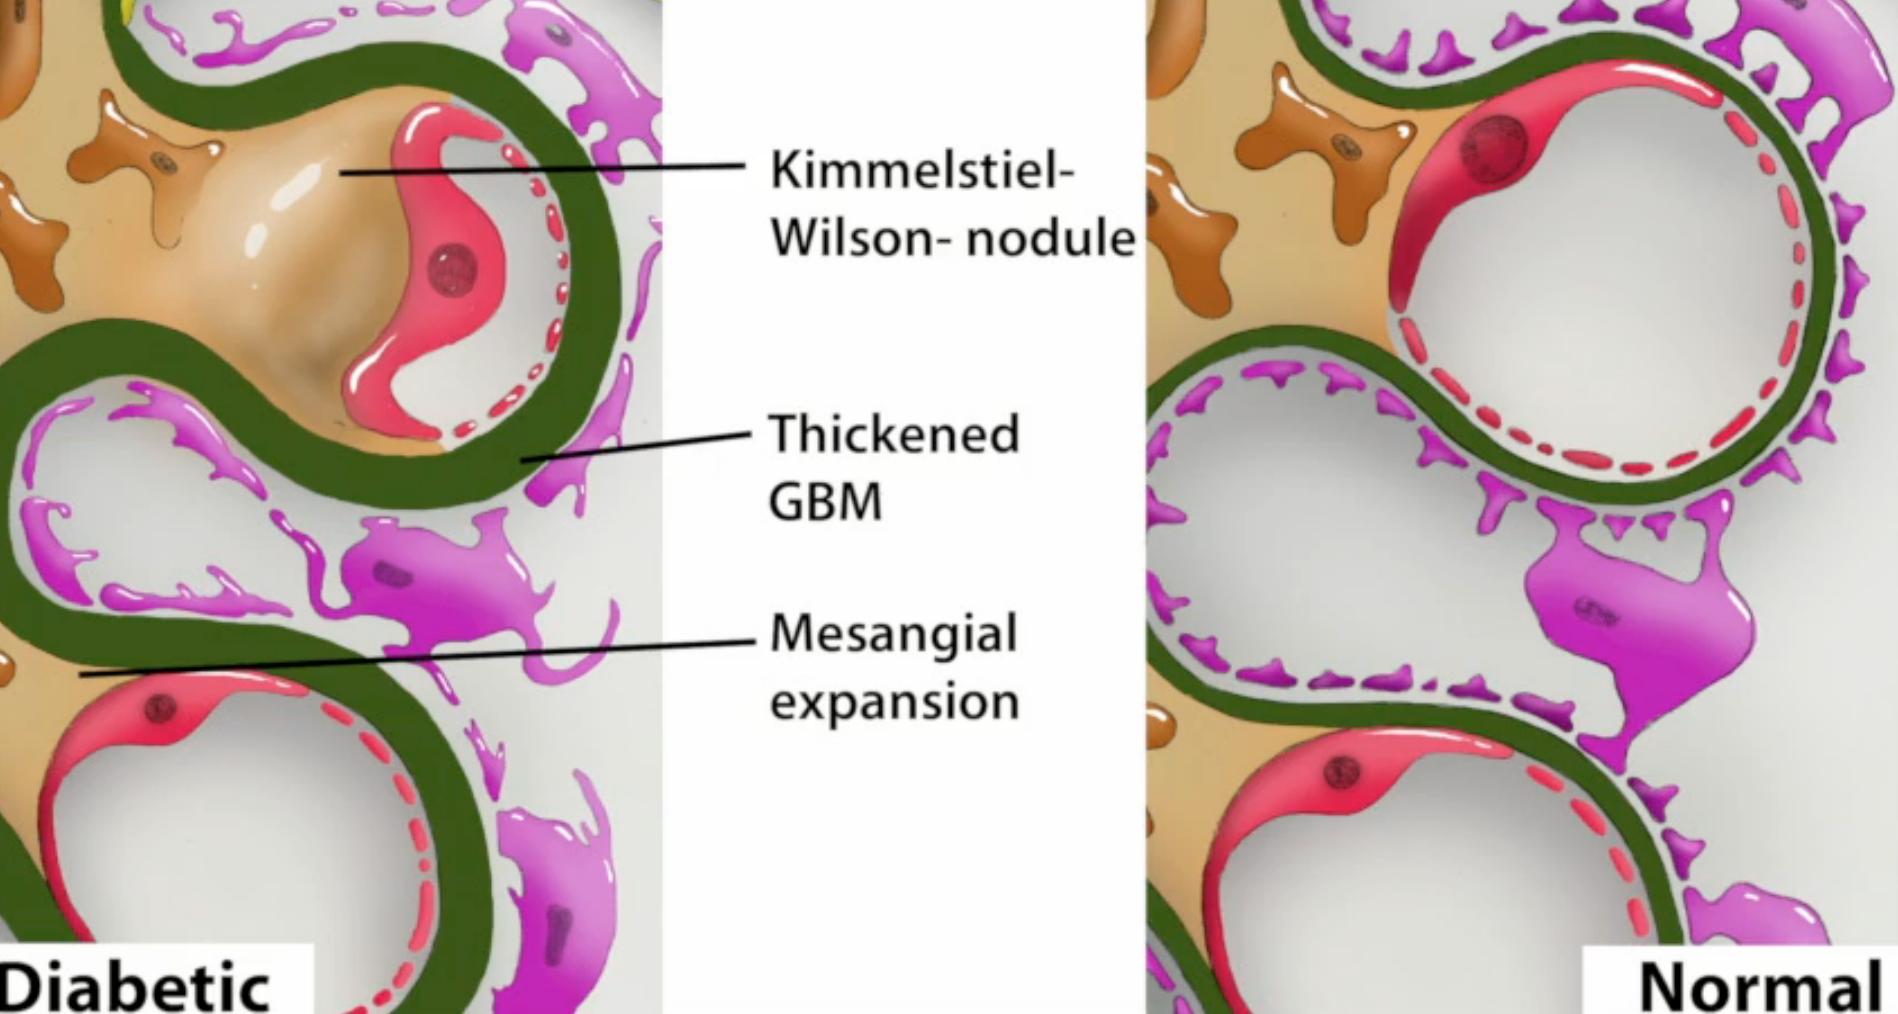 enfermedad de kimmelstiel-wilson emedicina diabetes